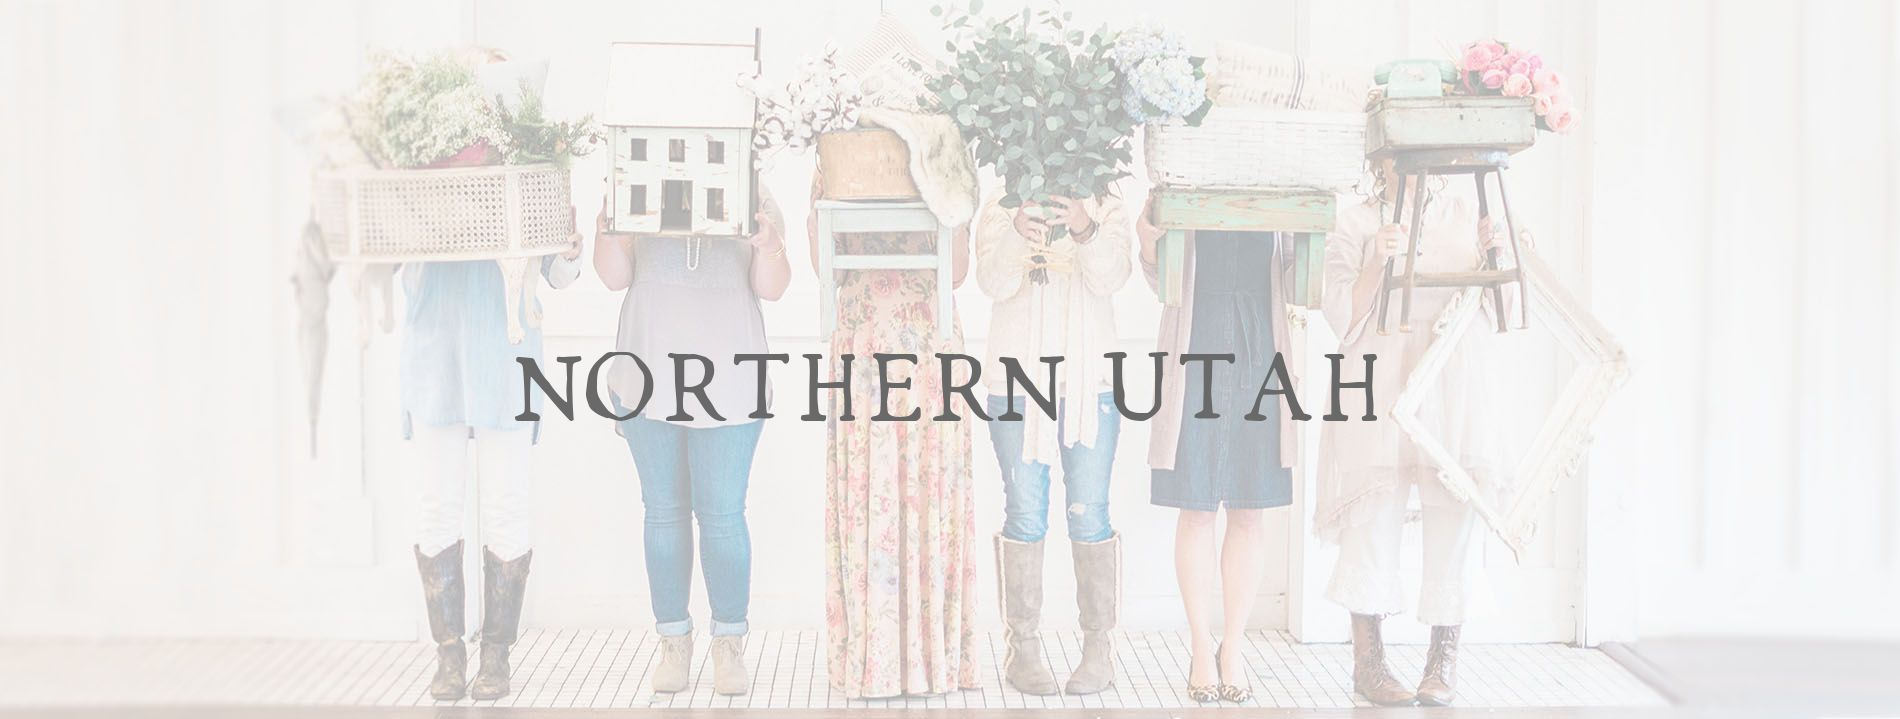 Northern Utah